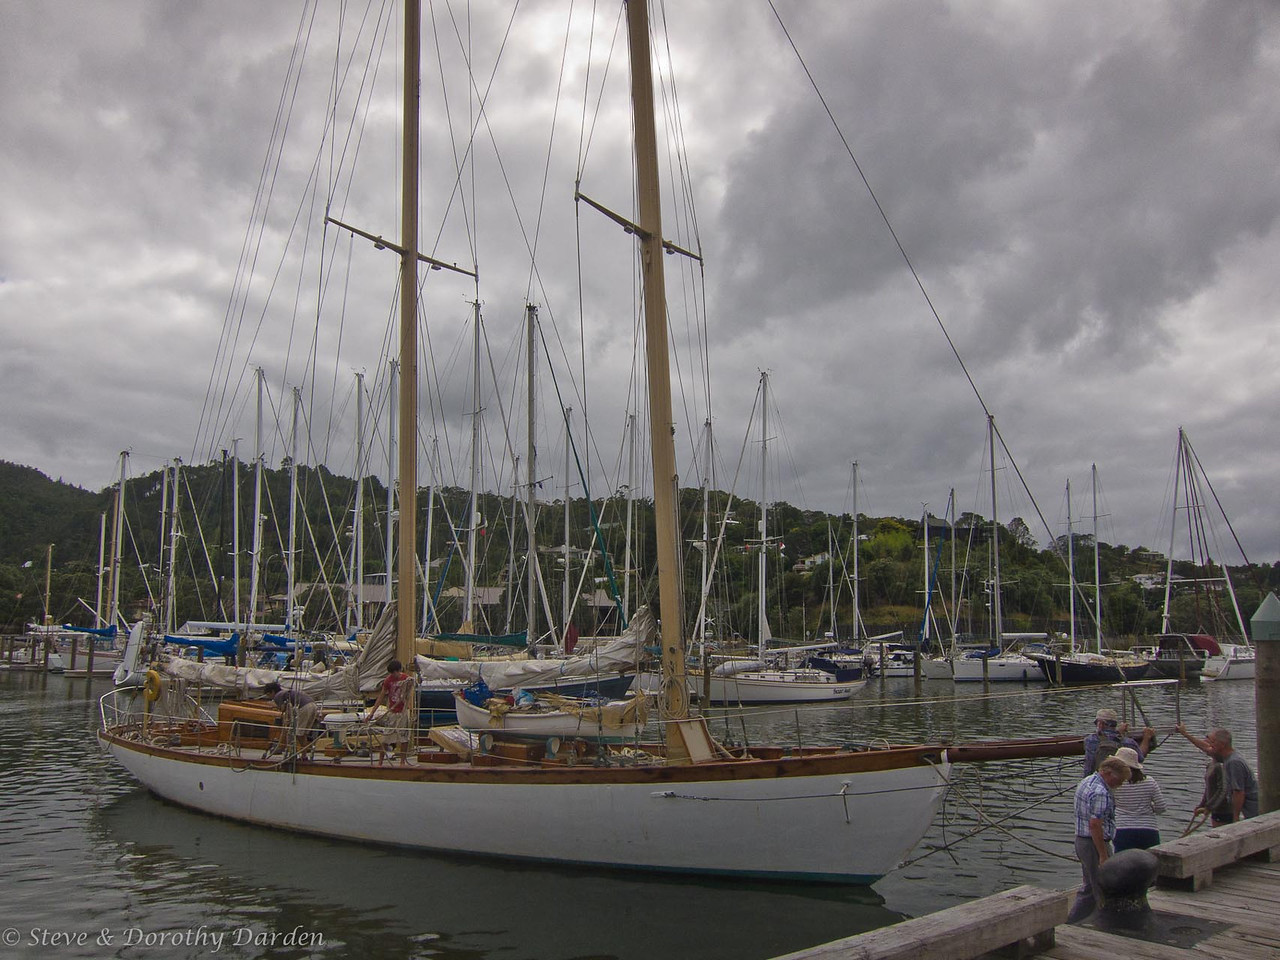 Schooner NINA turning around at Town Basin marina